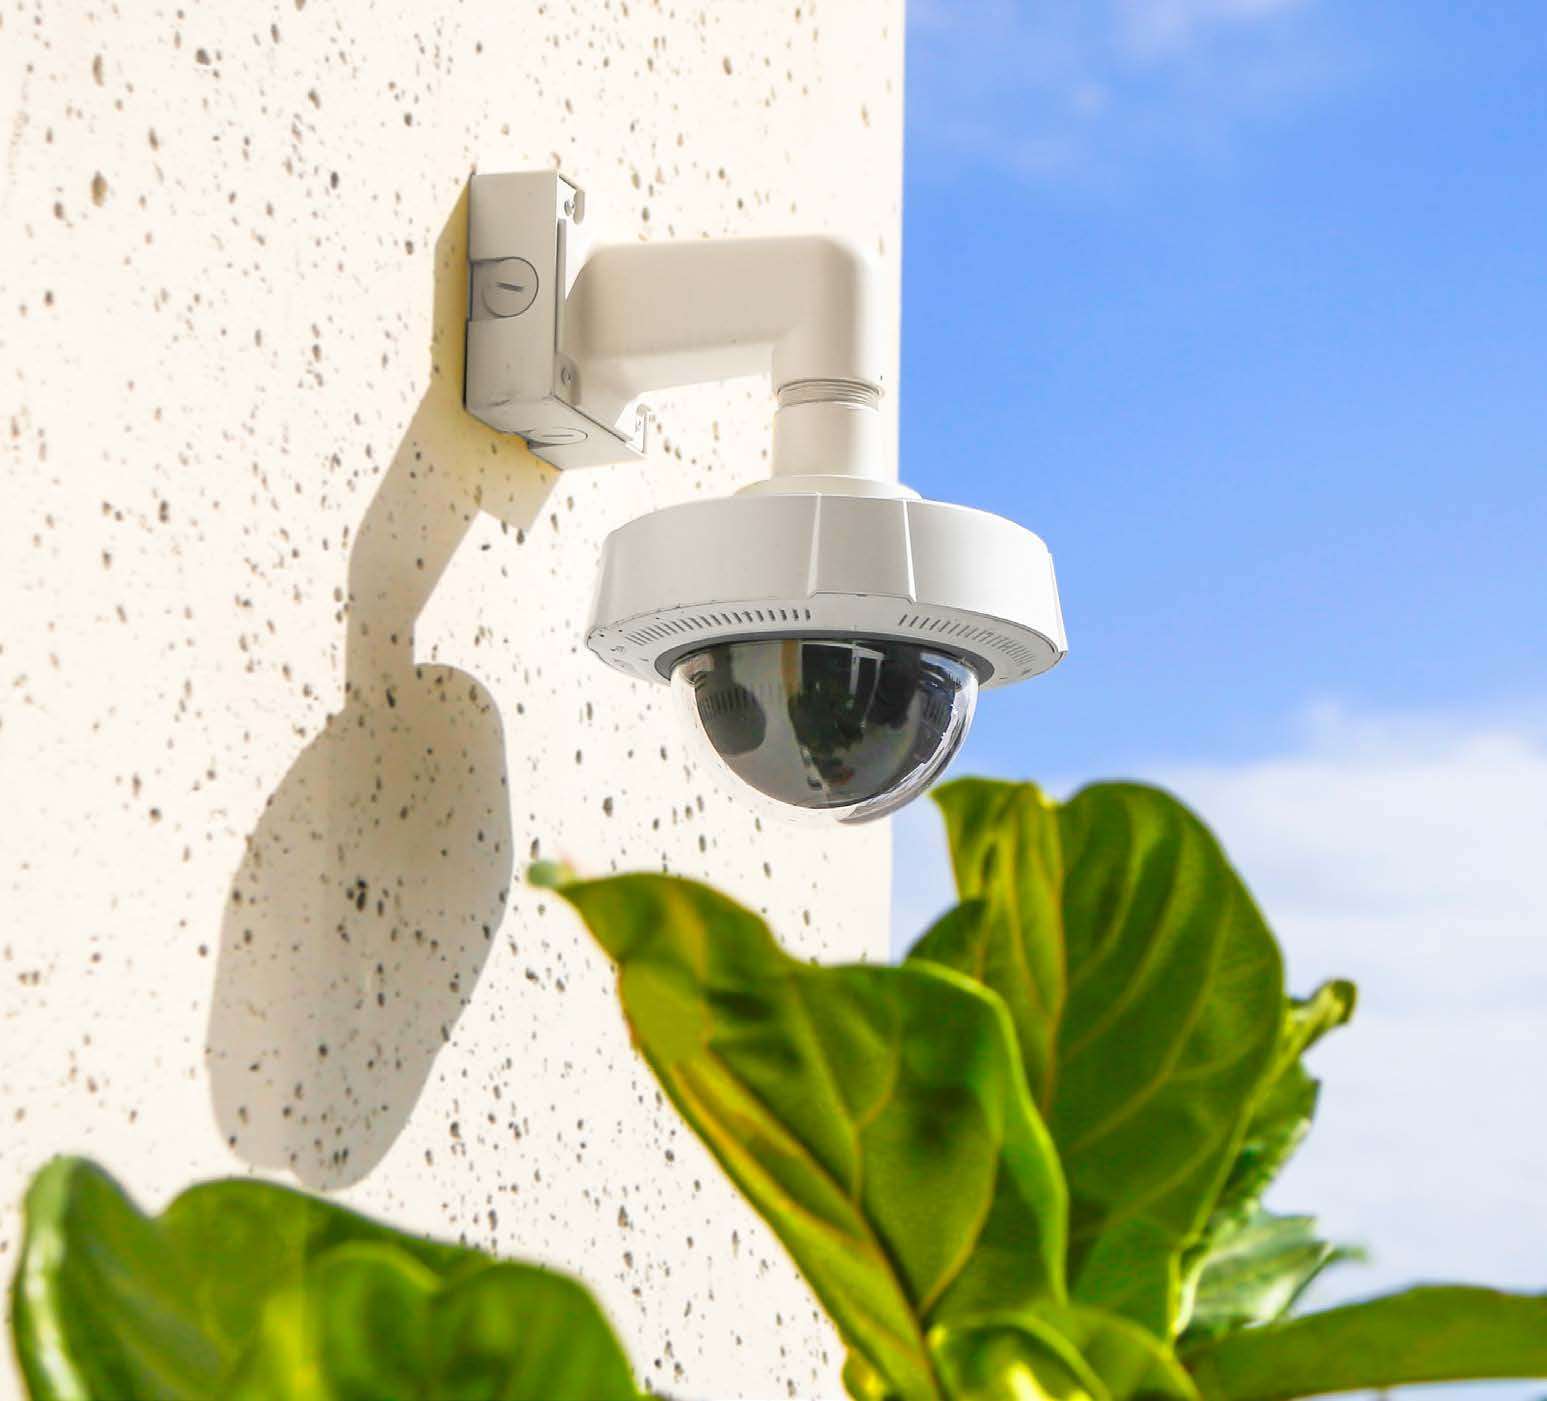 safe and secure whitepaper camera